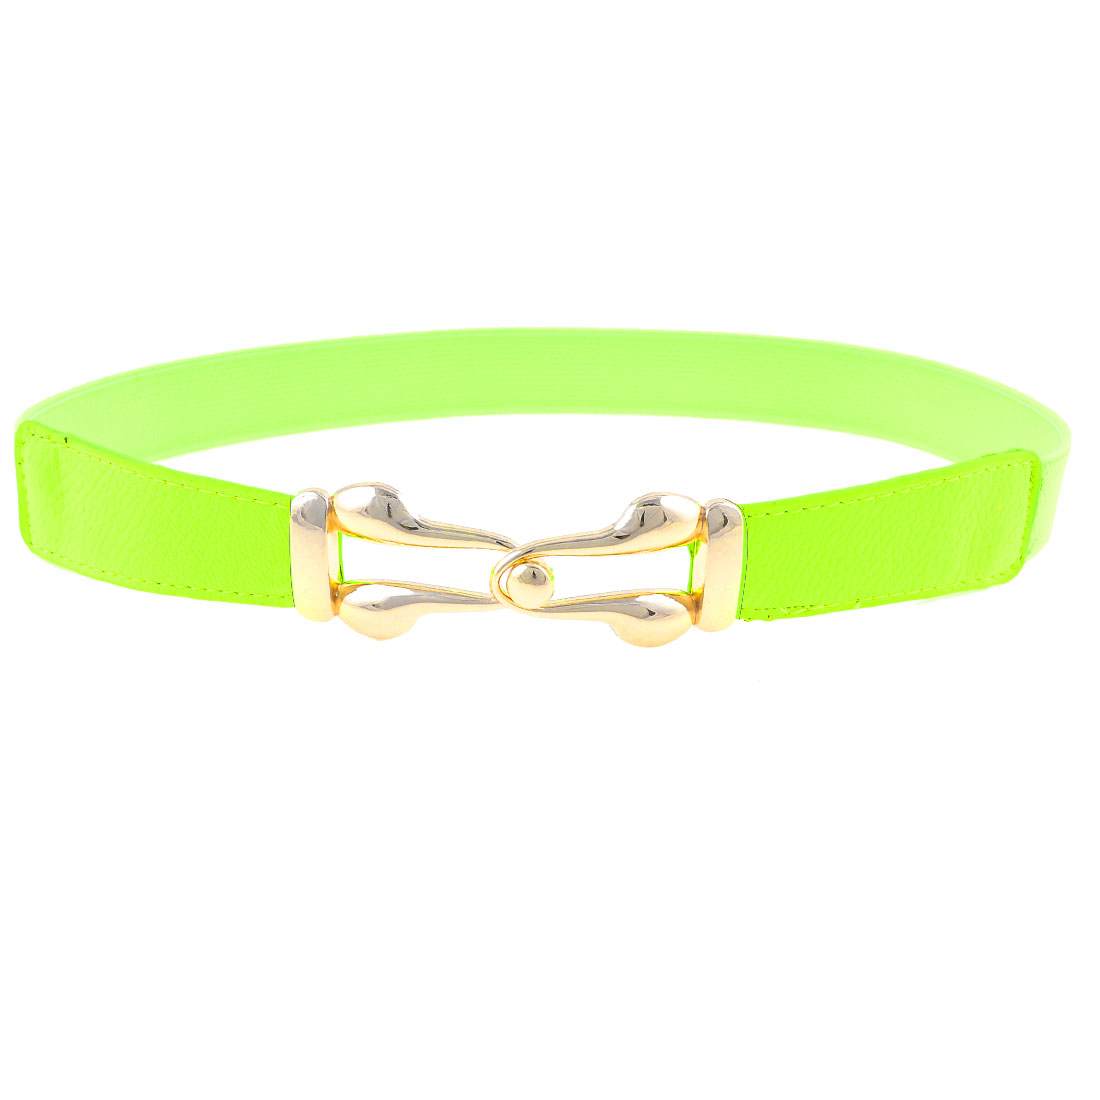 Metal Interlock Buckle 2.5cm Width Light Green Flexible Waist Belt Band for Lady